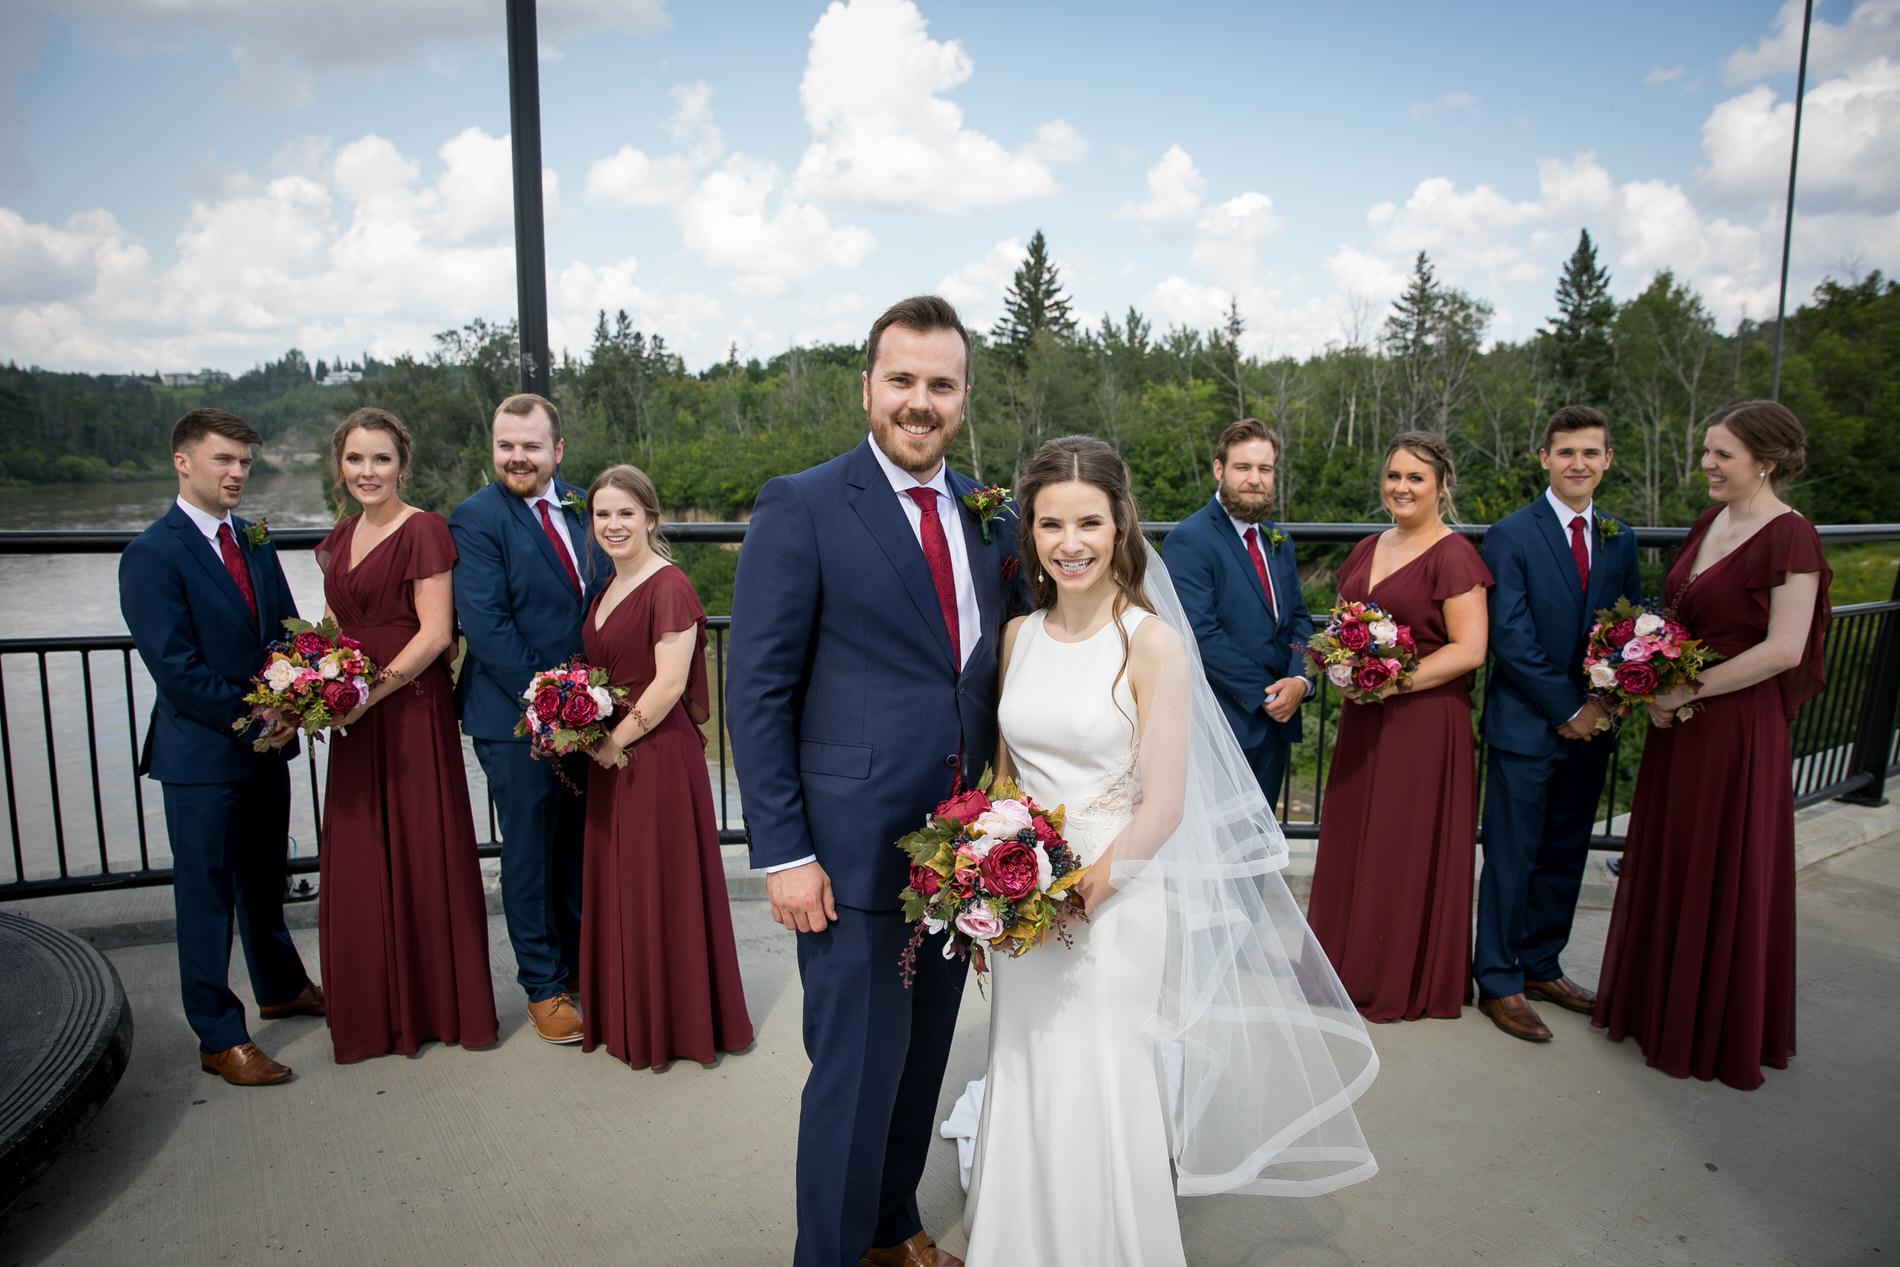 Bride and Groom pose for photo Edmonton Wedding Photographer